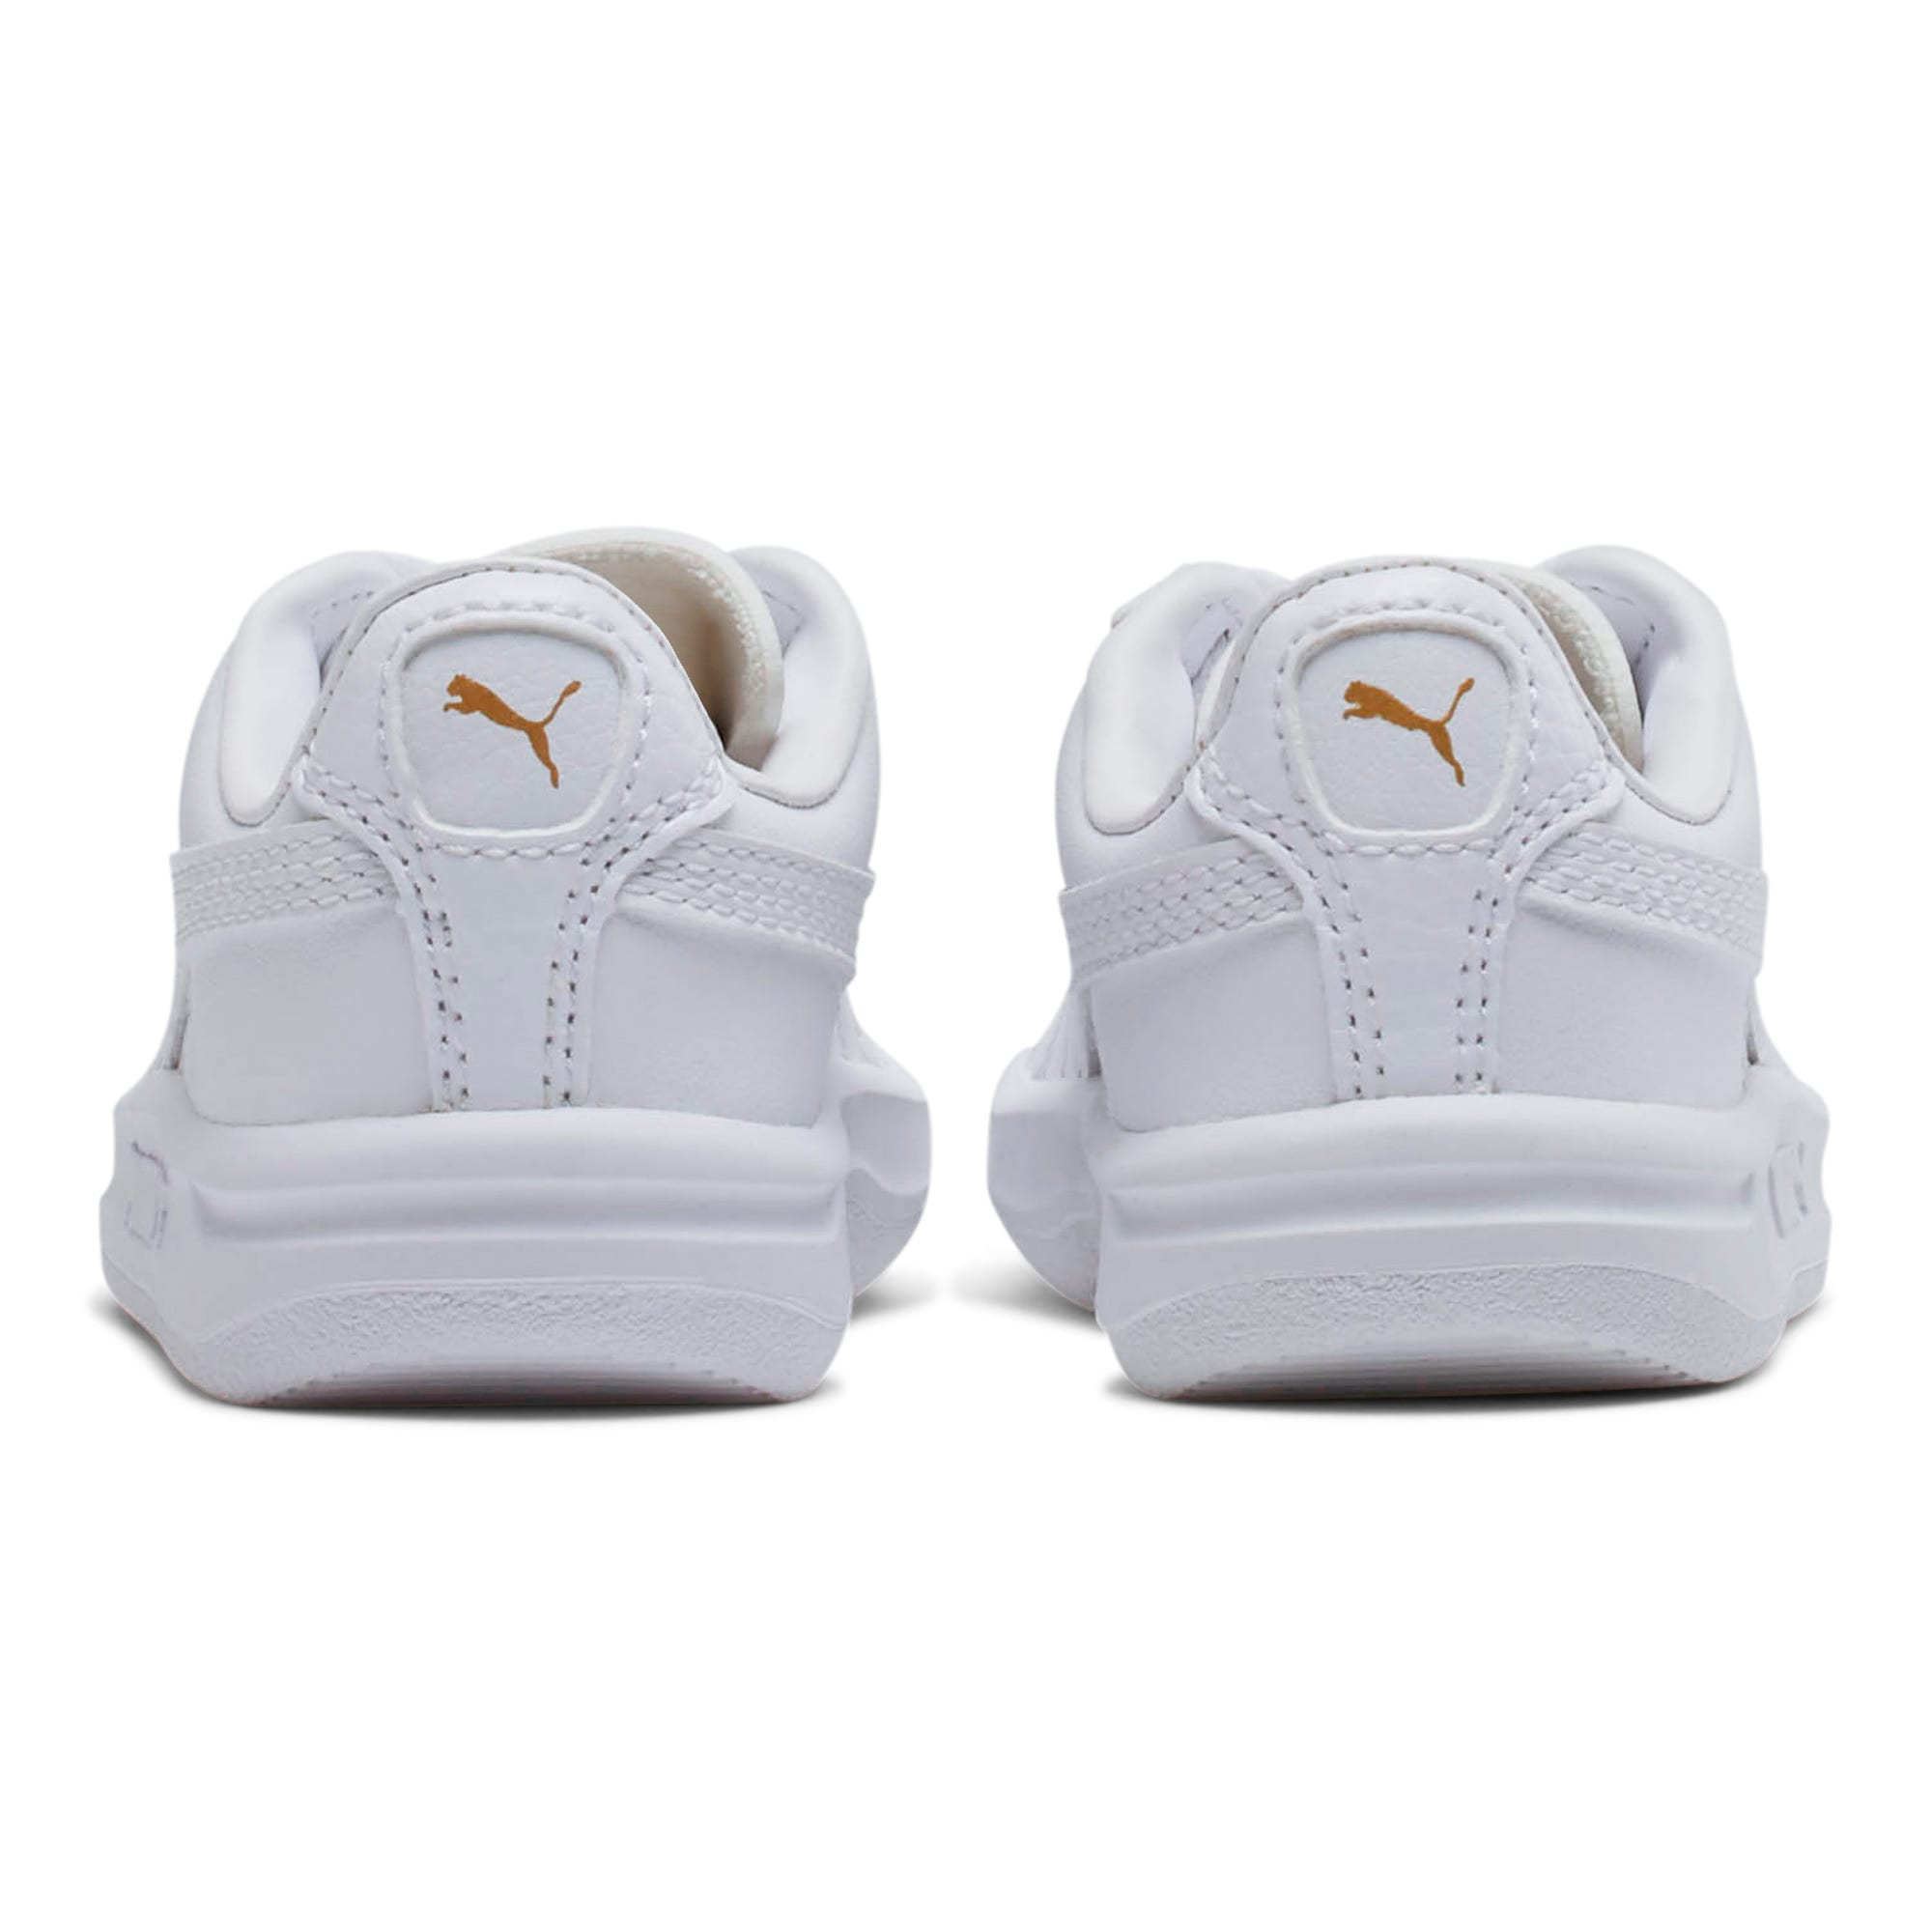 Thumbnail 4 of GV Special Toddler Shoes, Puma White-Puma Team Gold, medium